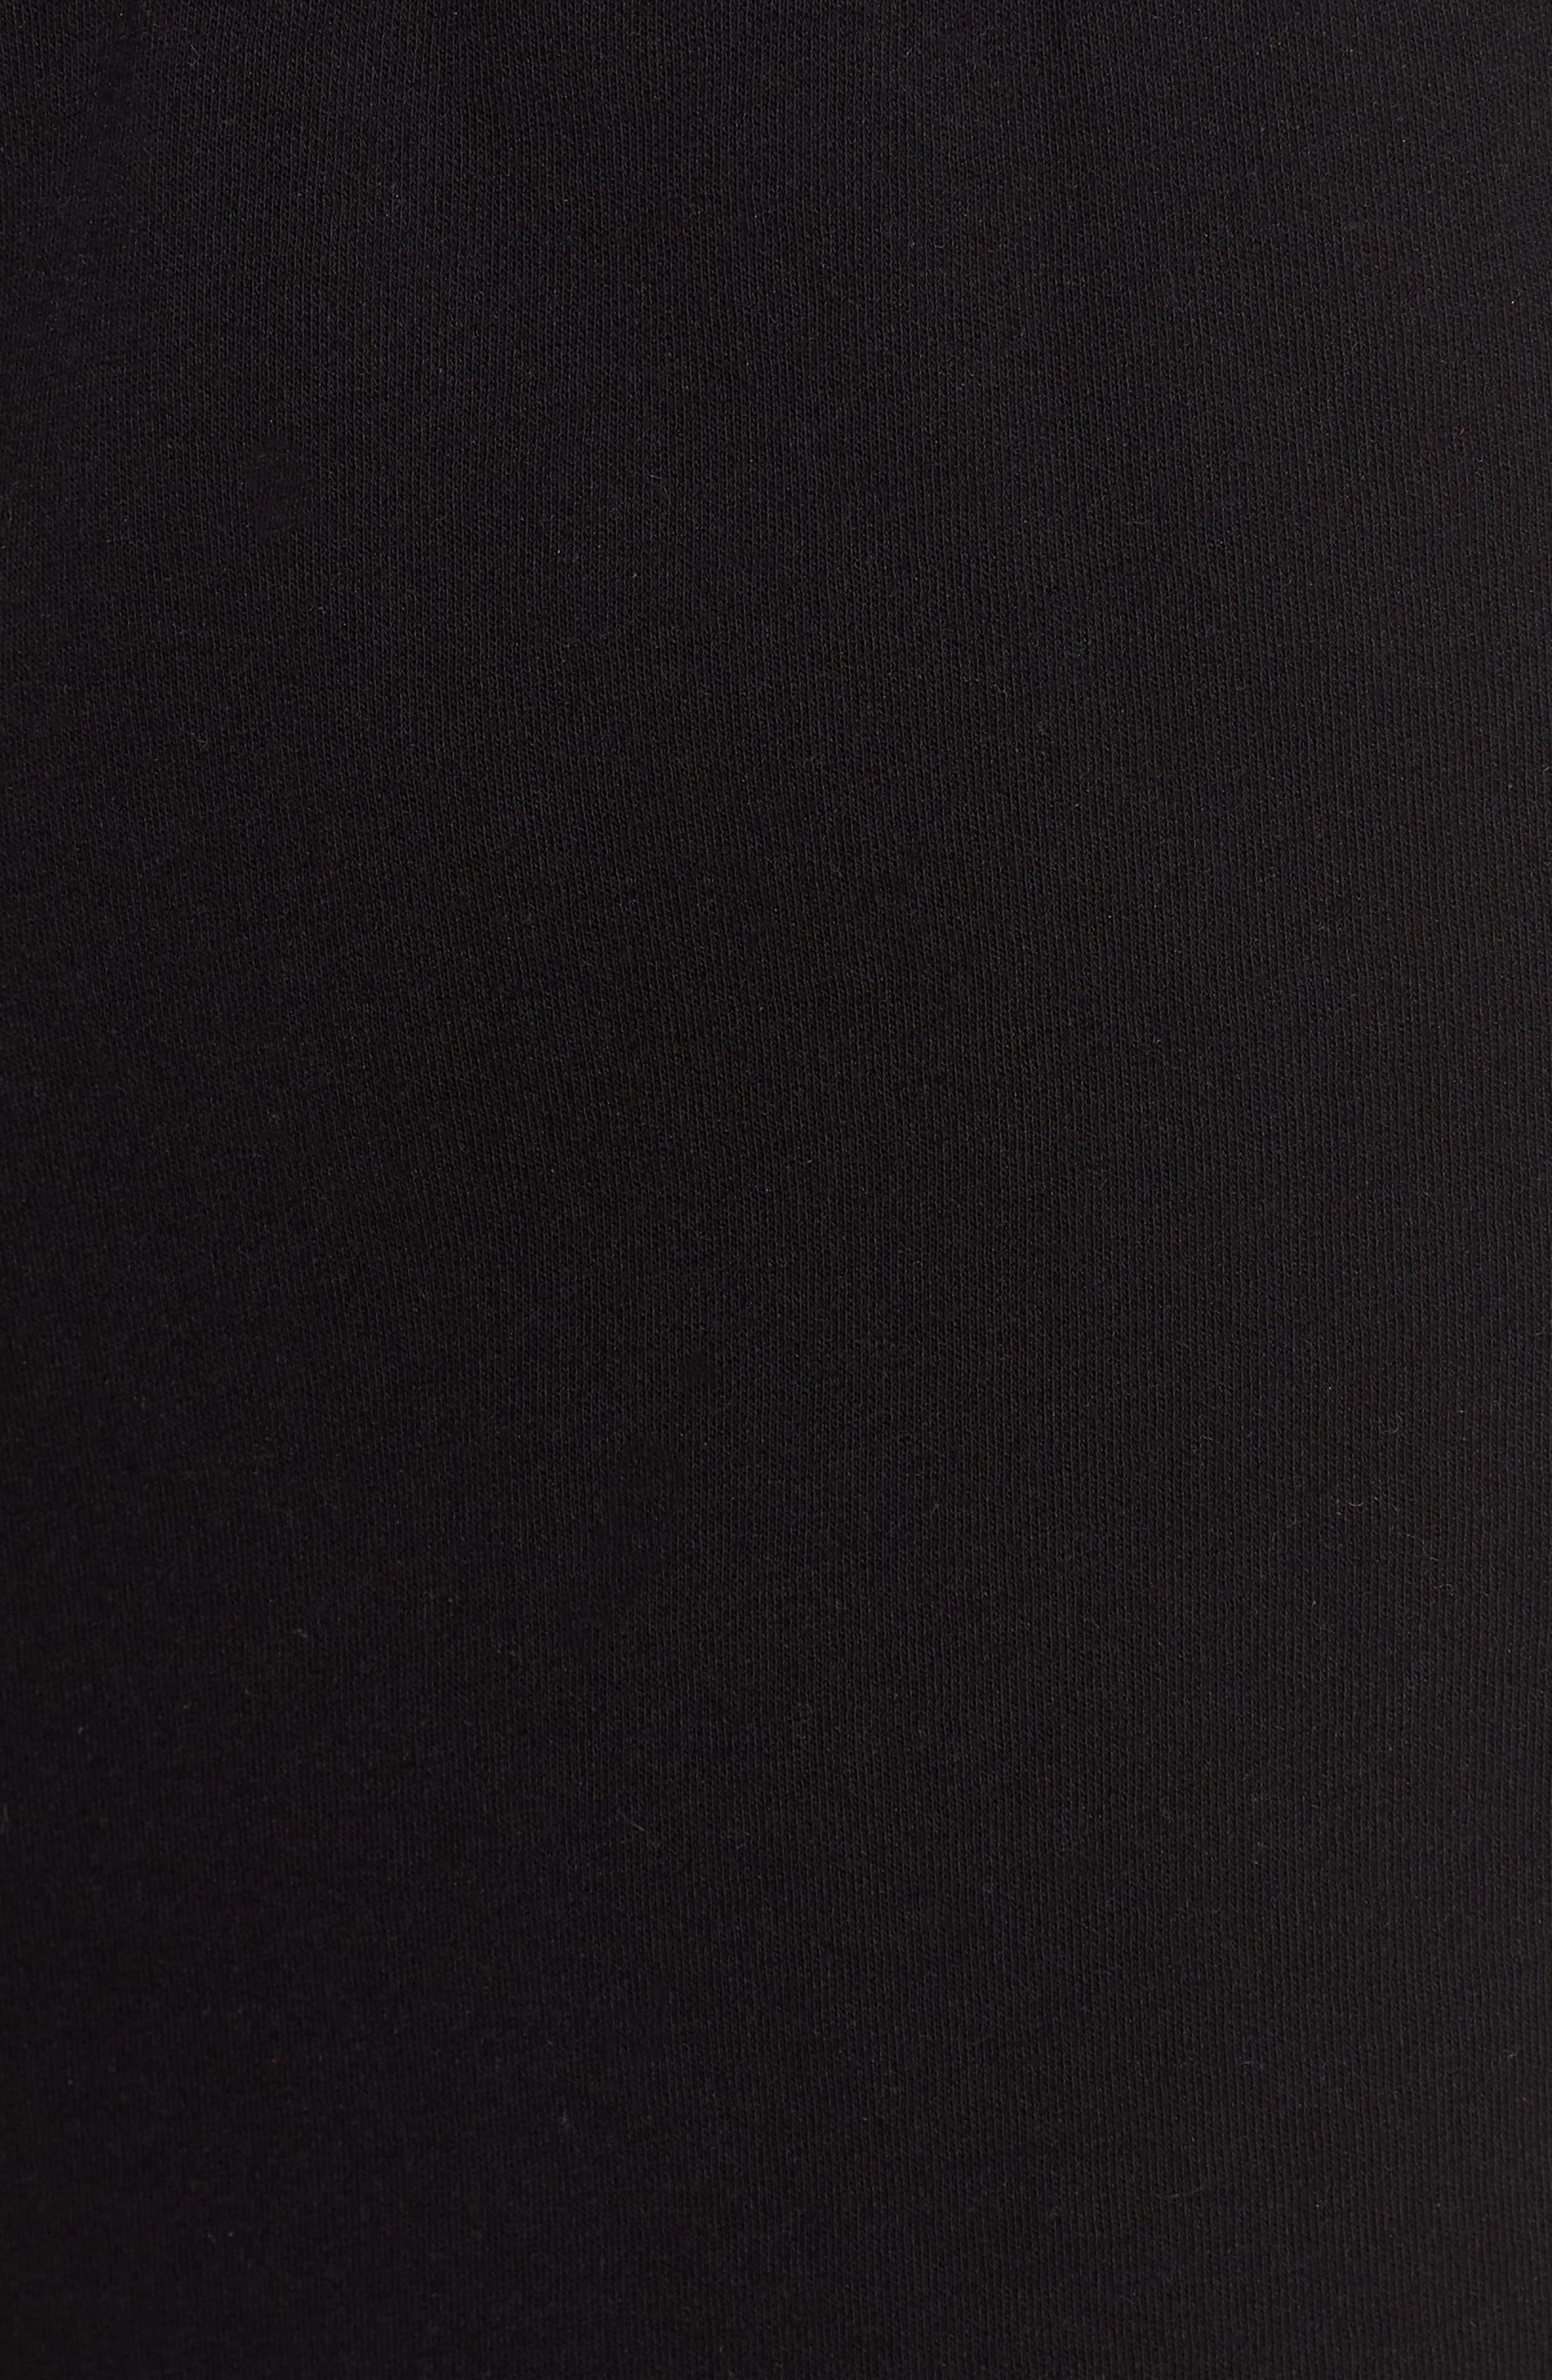 Gym Shorts,                             Alternate thumbnail 5, color,                             BLACK